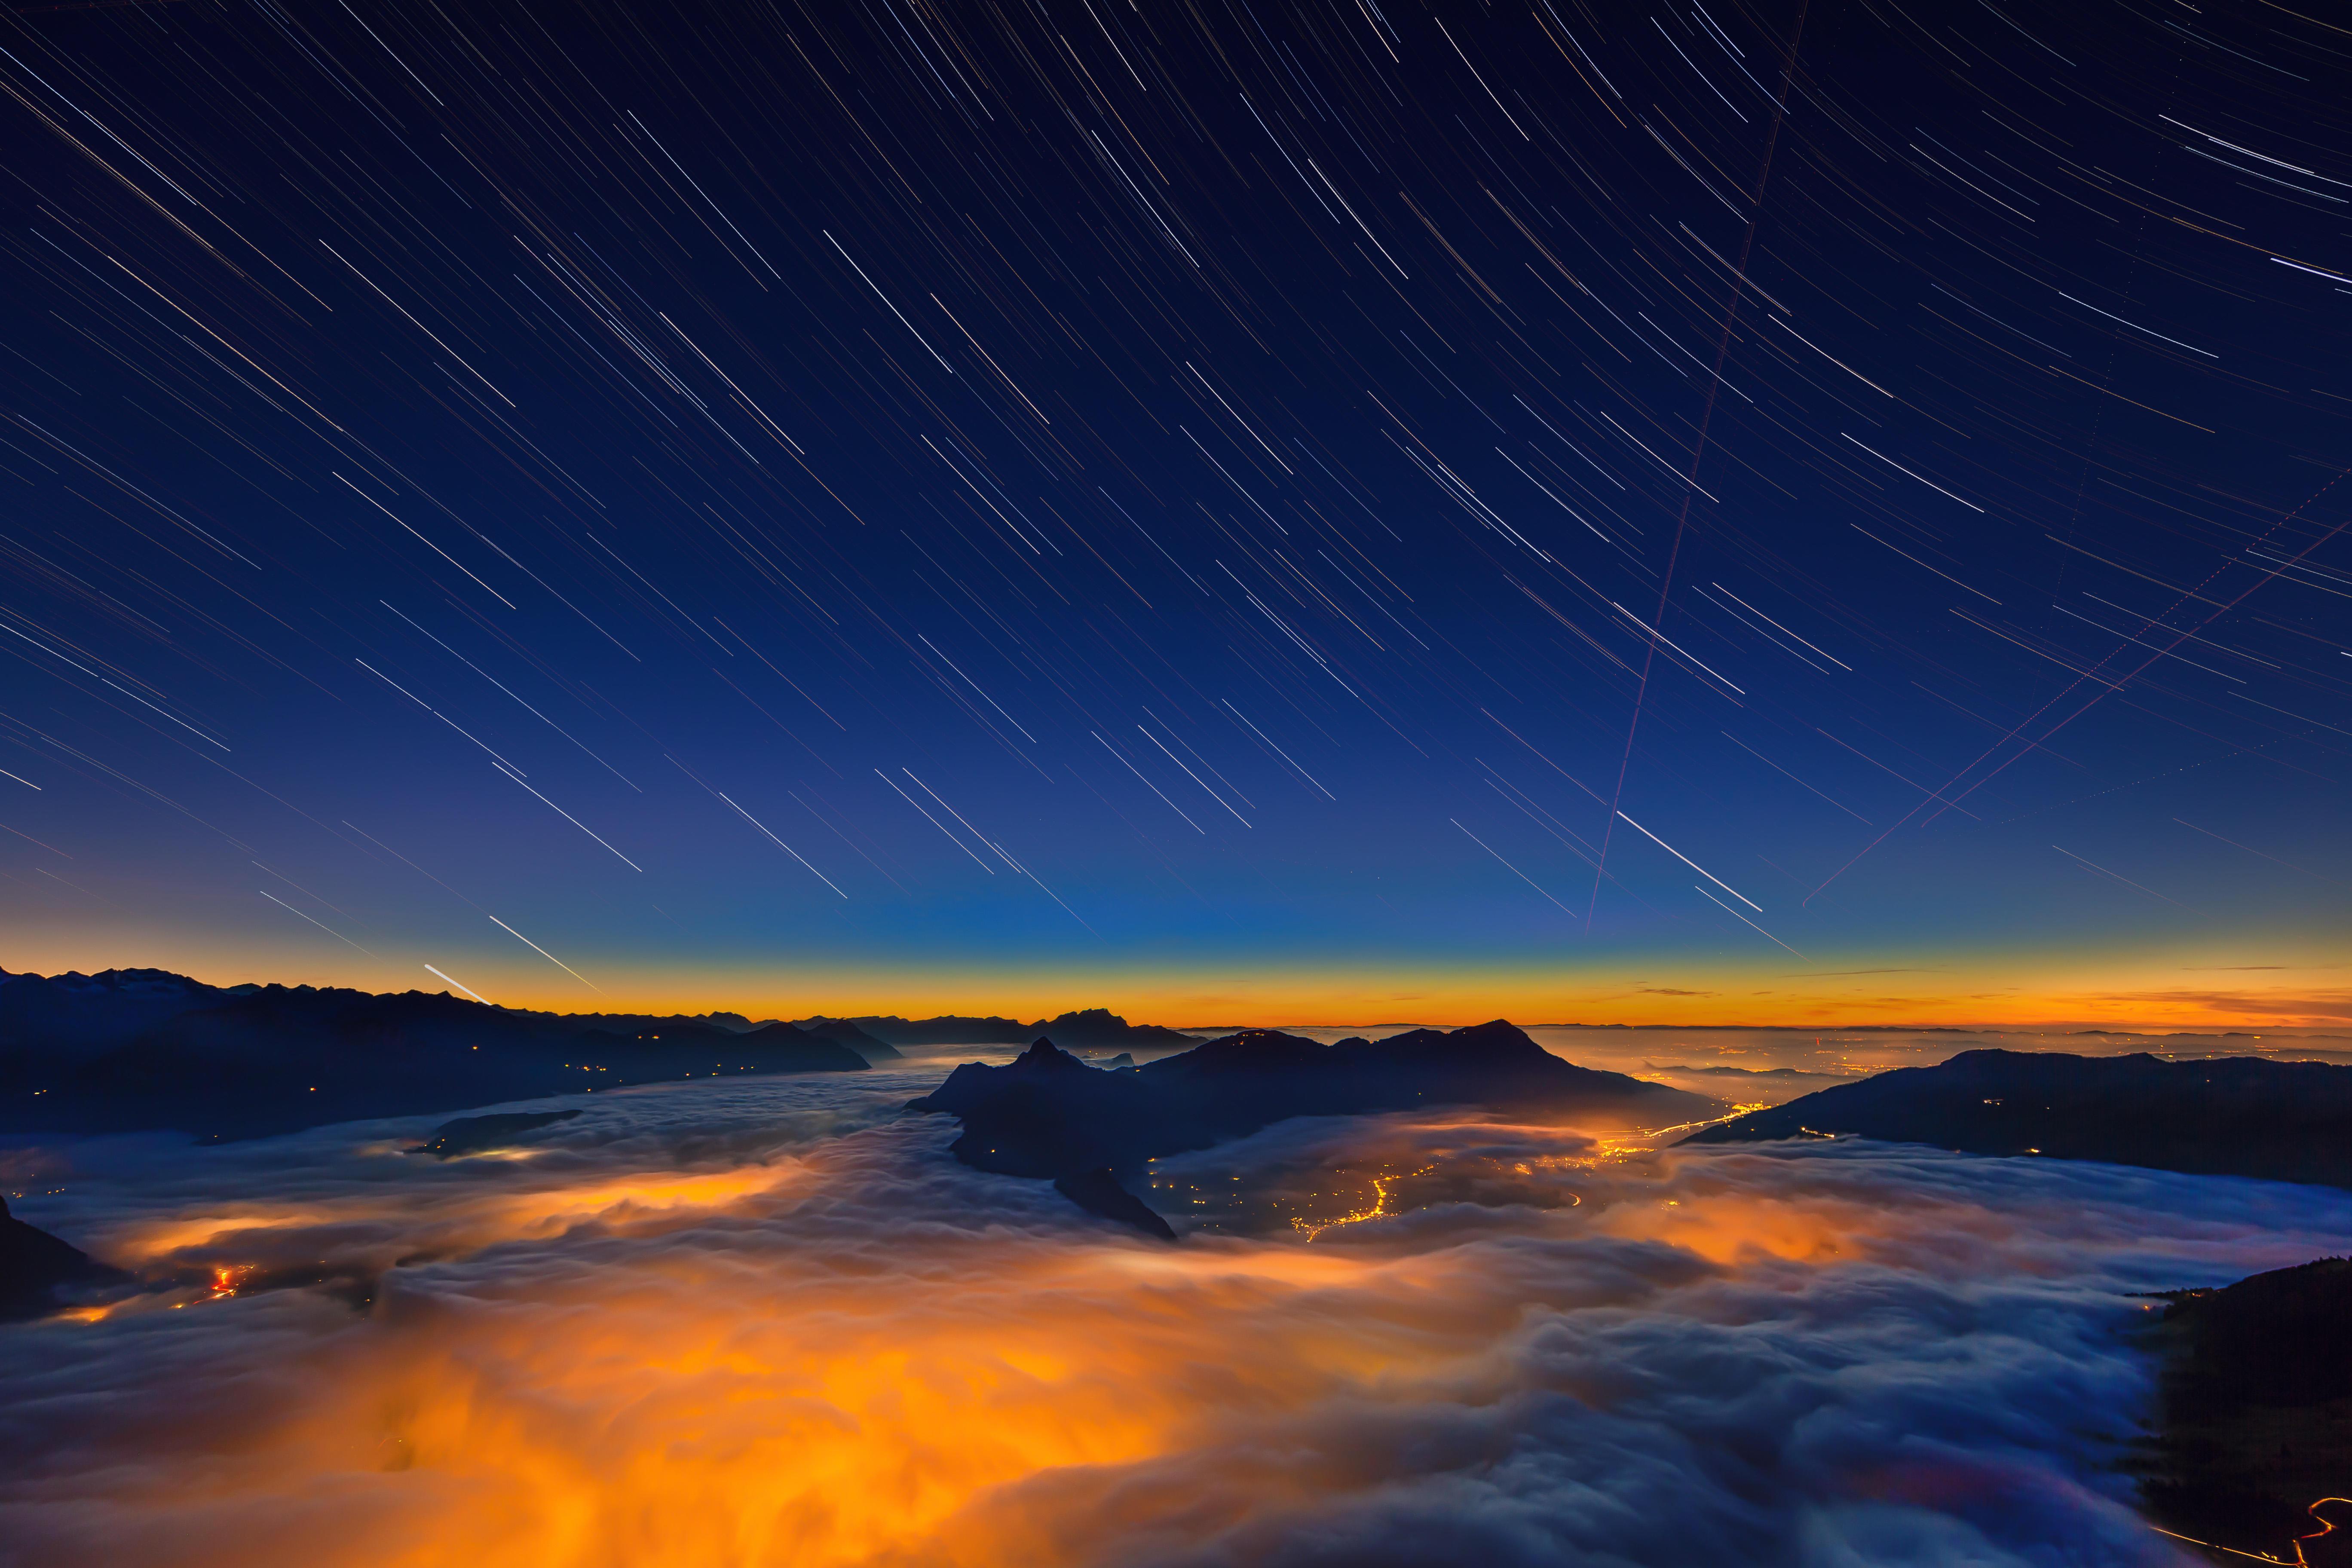 обои Море тумана, Восход, Панорама, Швейцария картинки фото